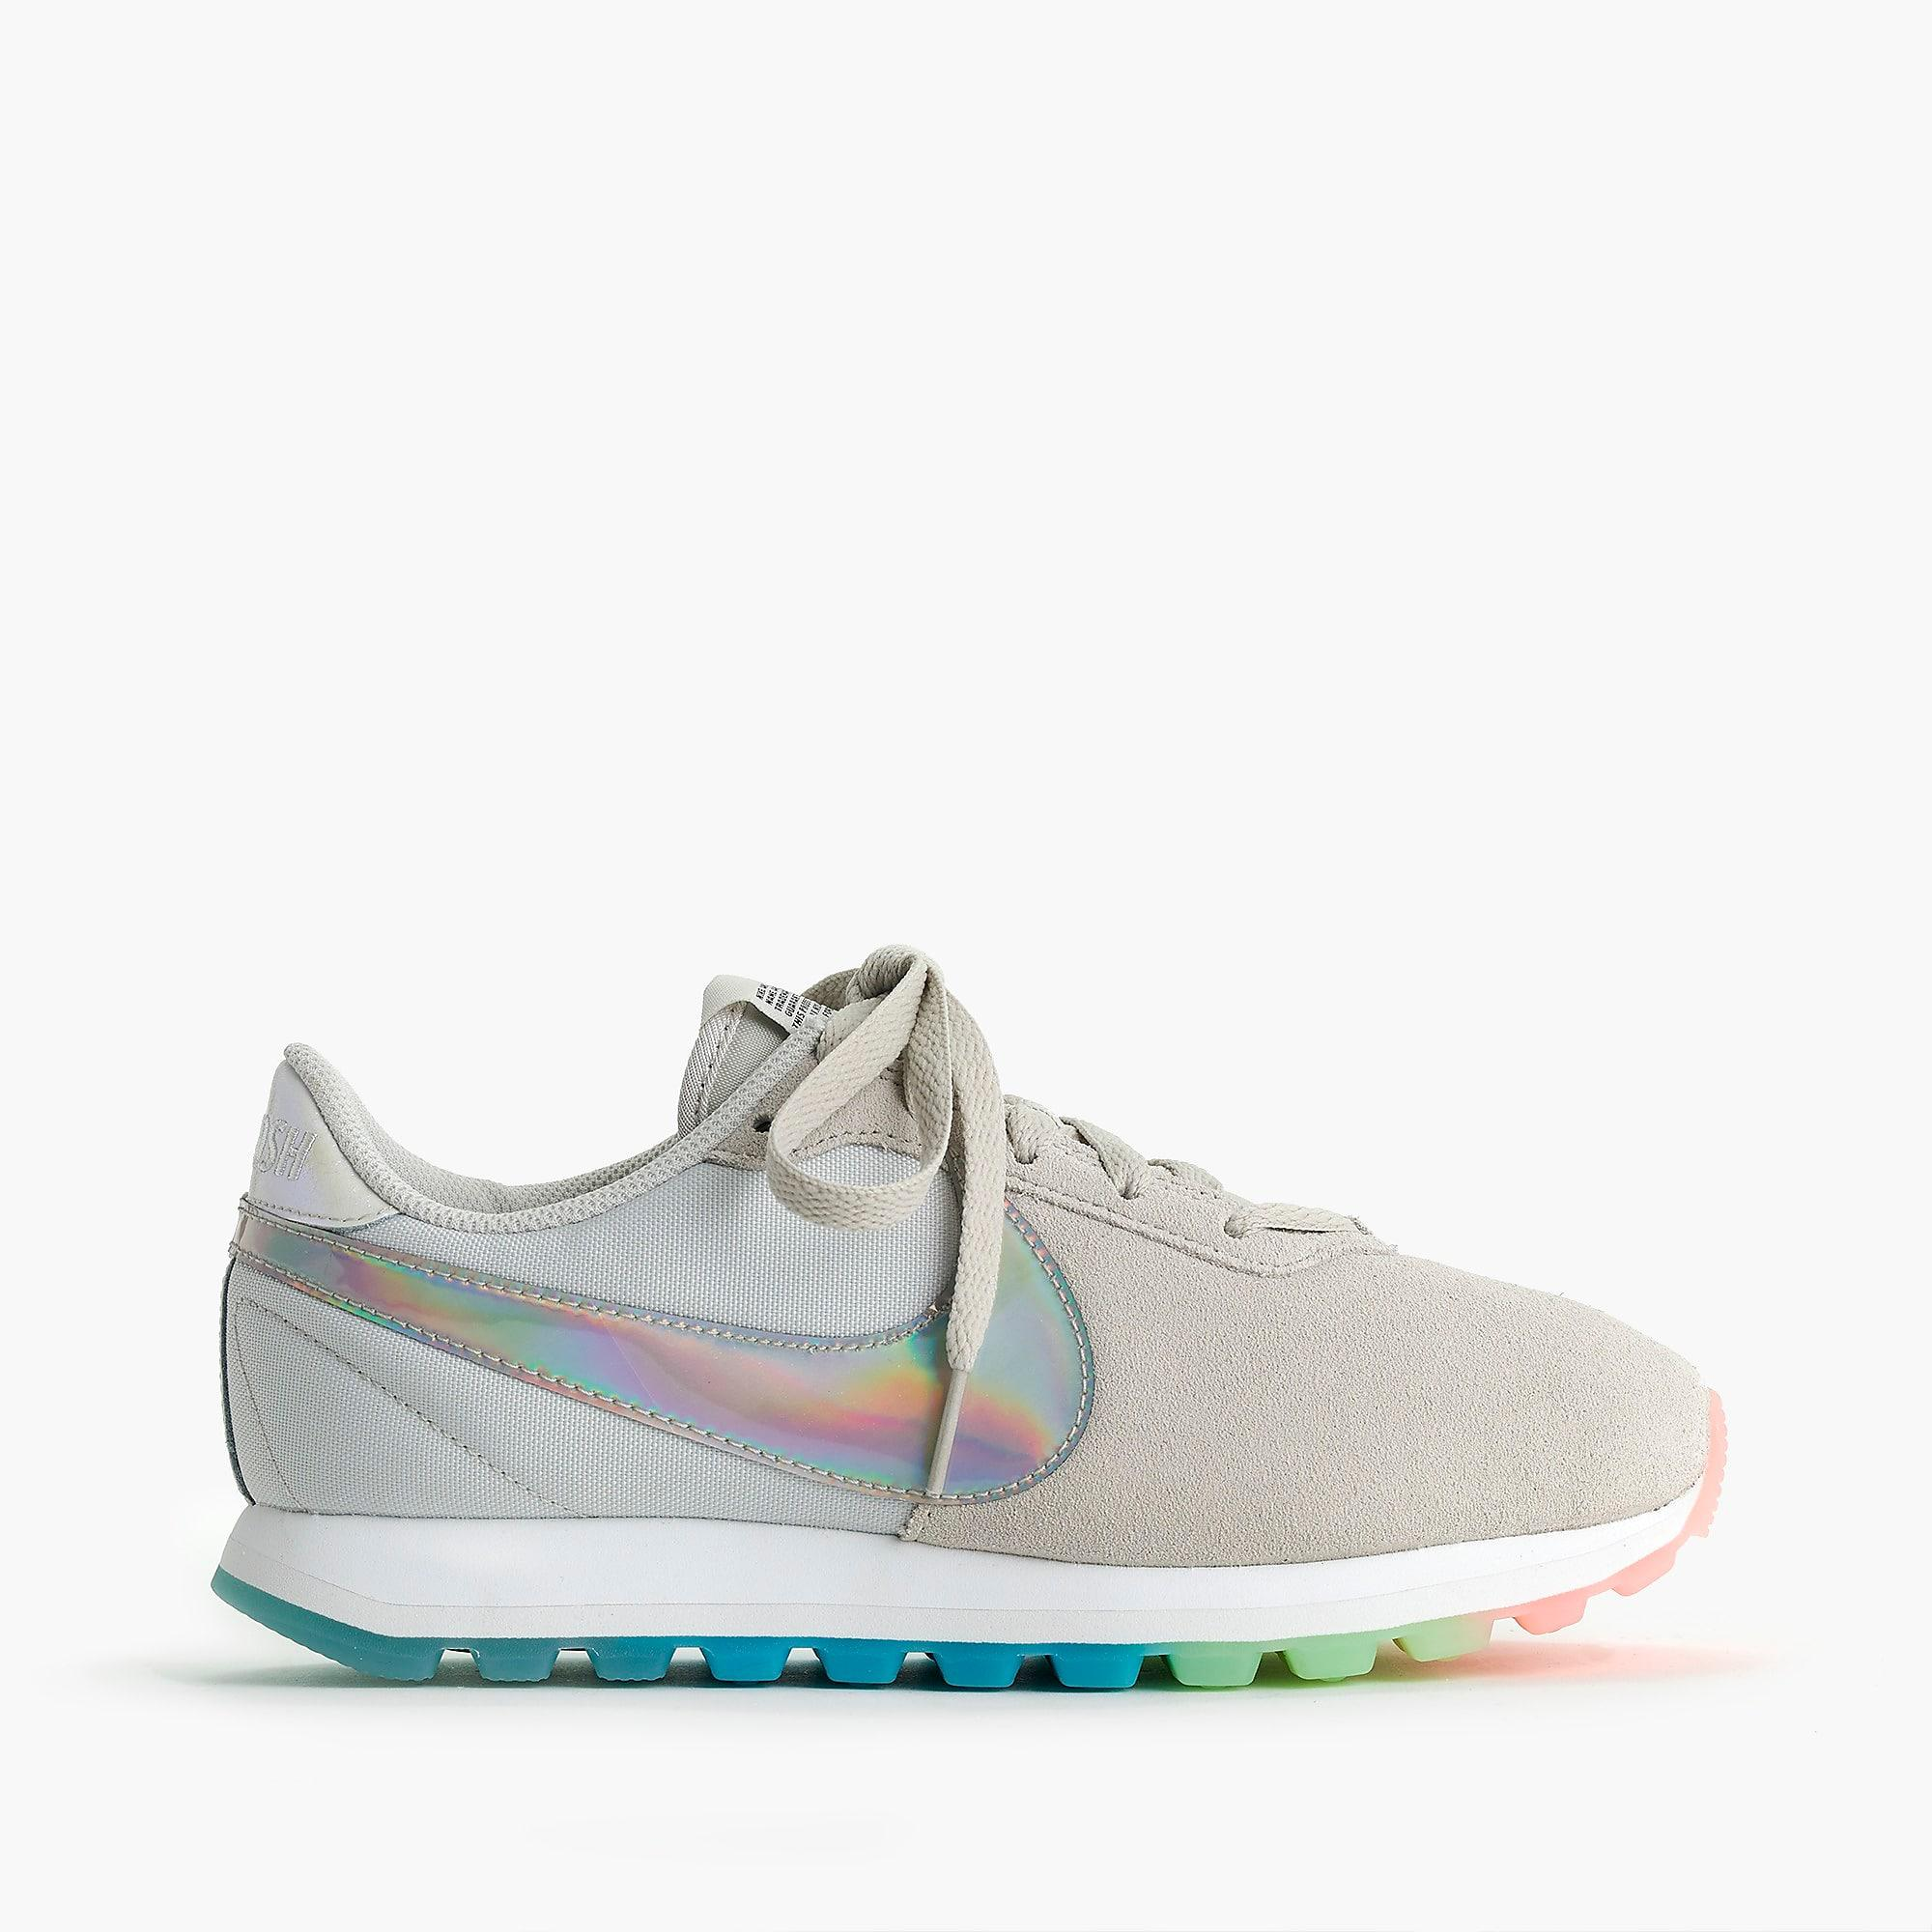 10e93b10066c69 Lyst - Nike Pre Love O.x. Sneakers In Suede